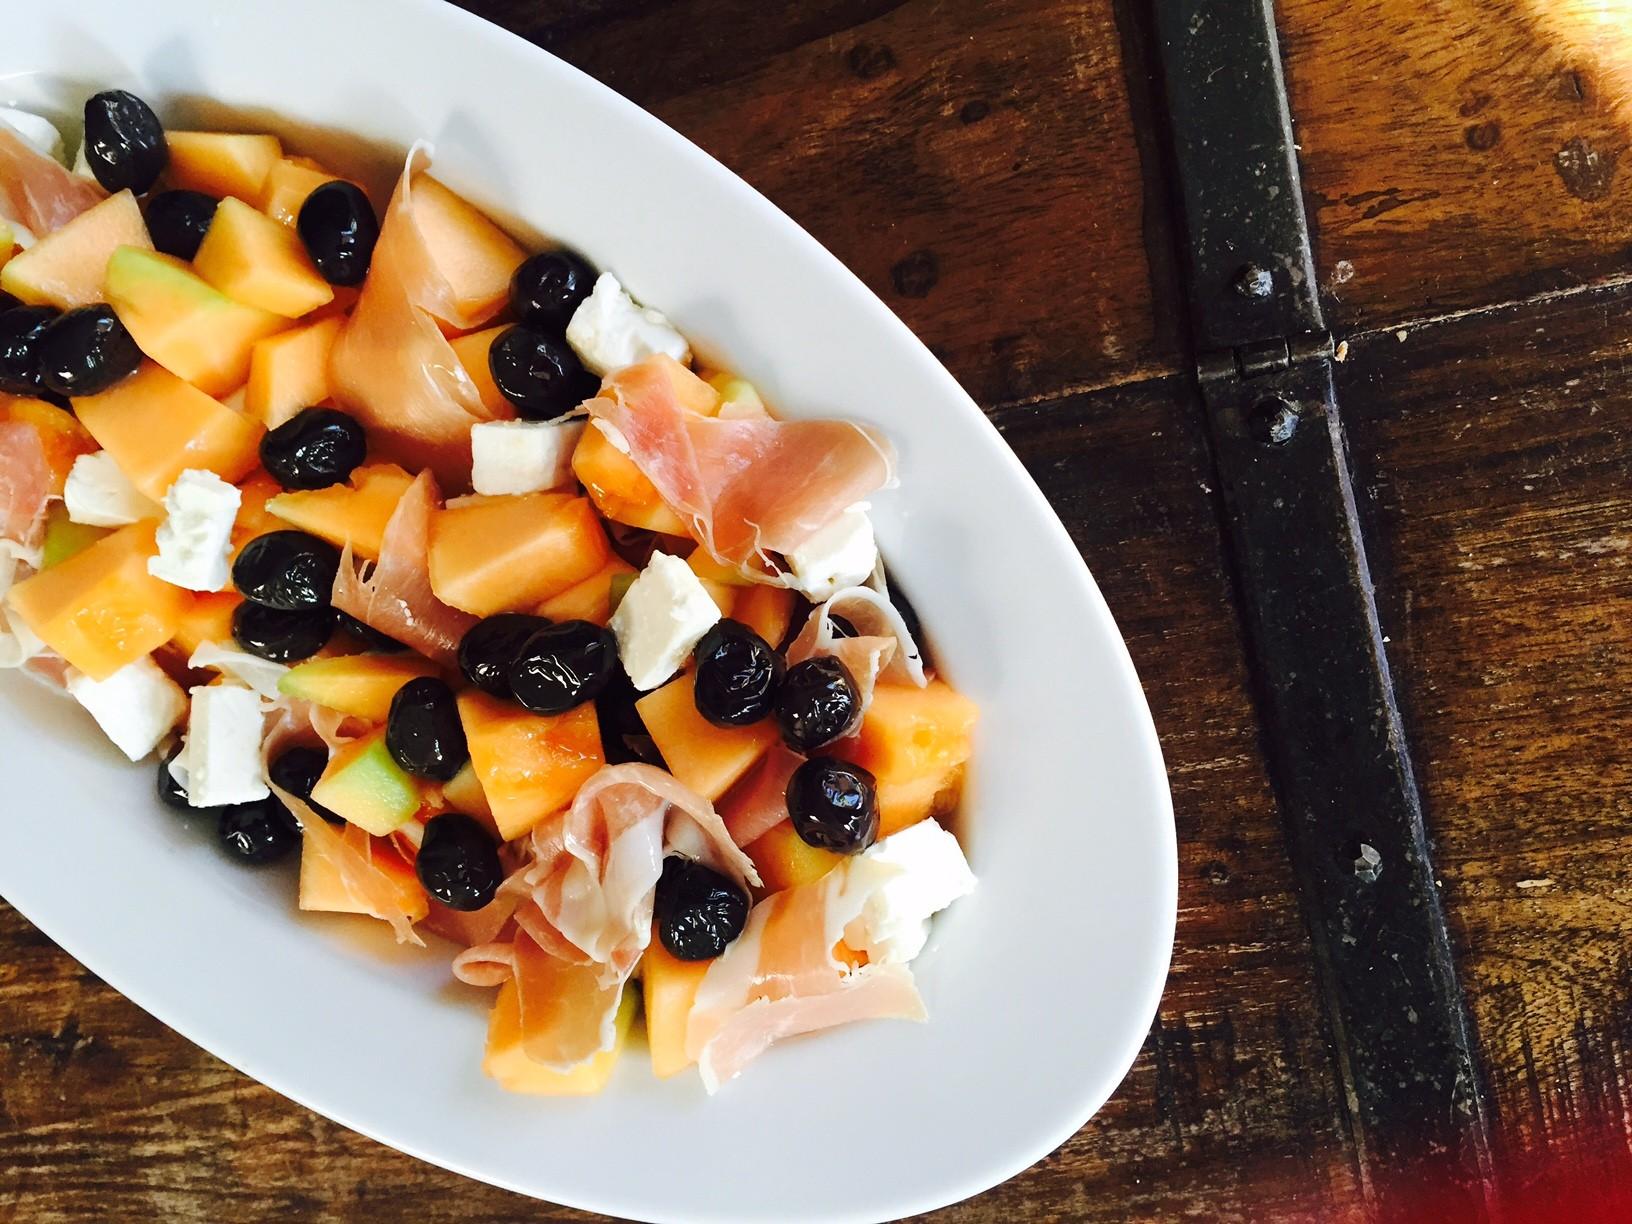 Meloensalade met ham en feta recept van foodblog Foodinista